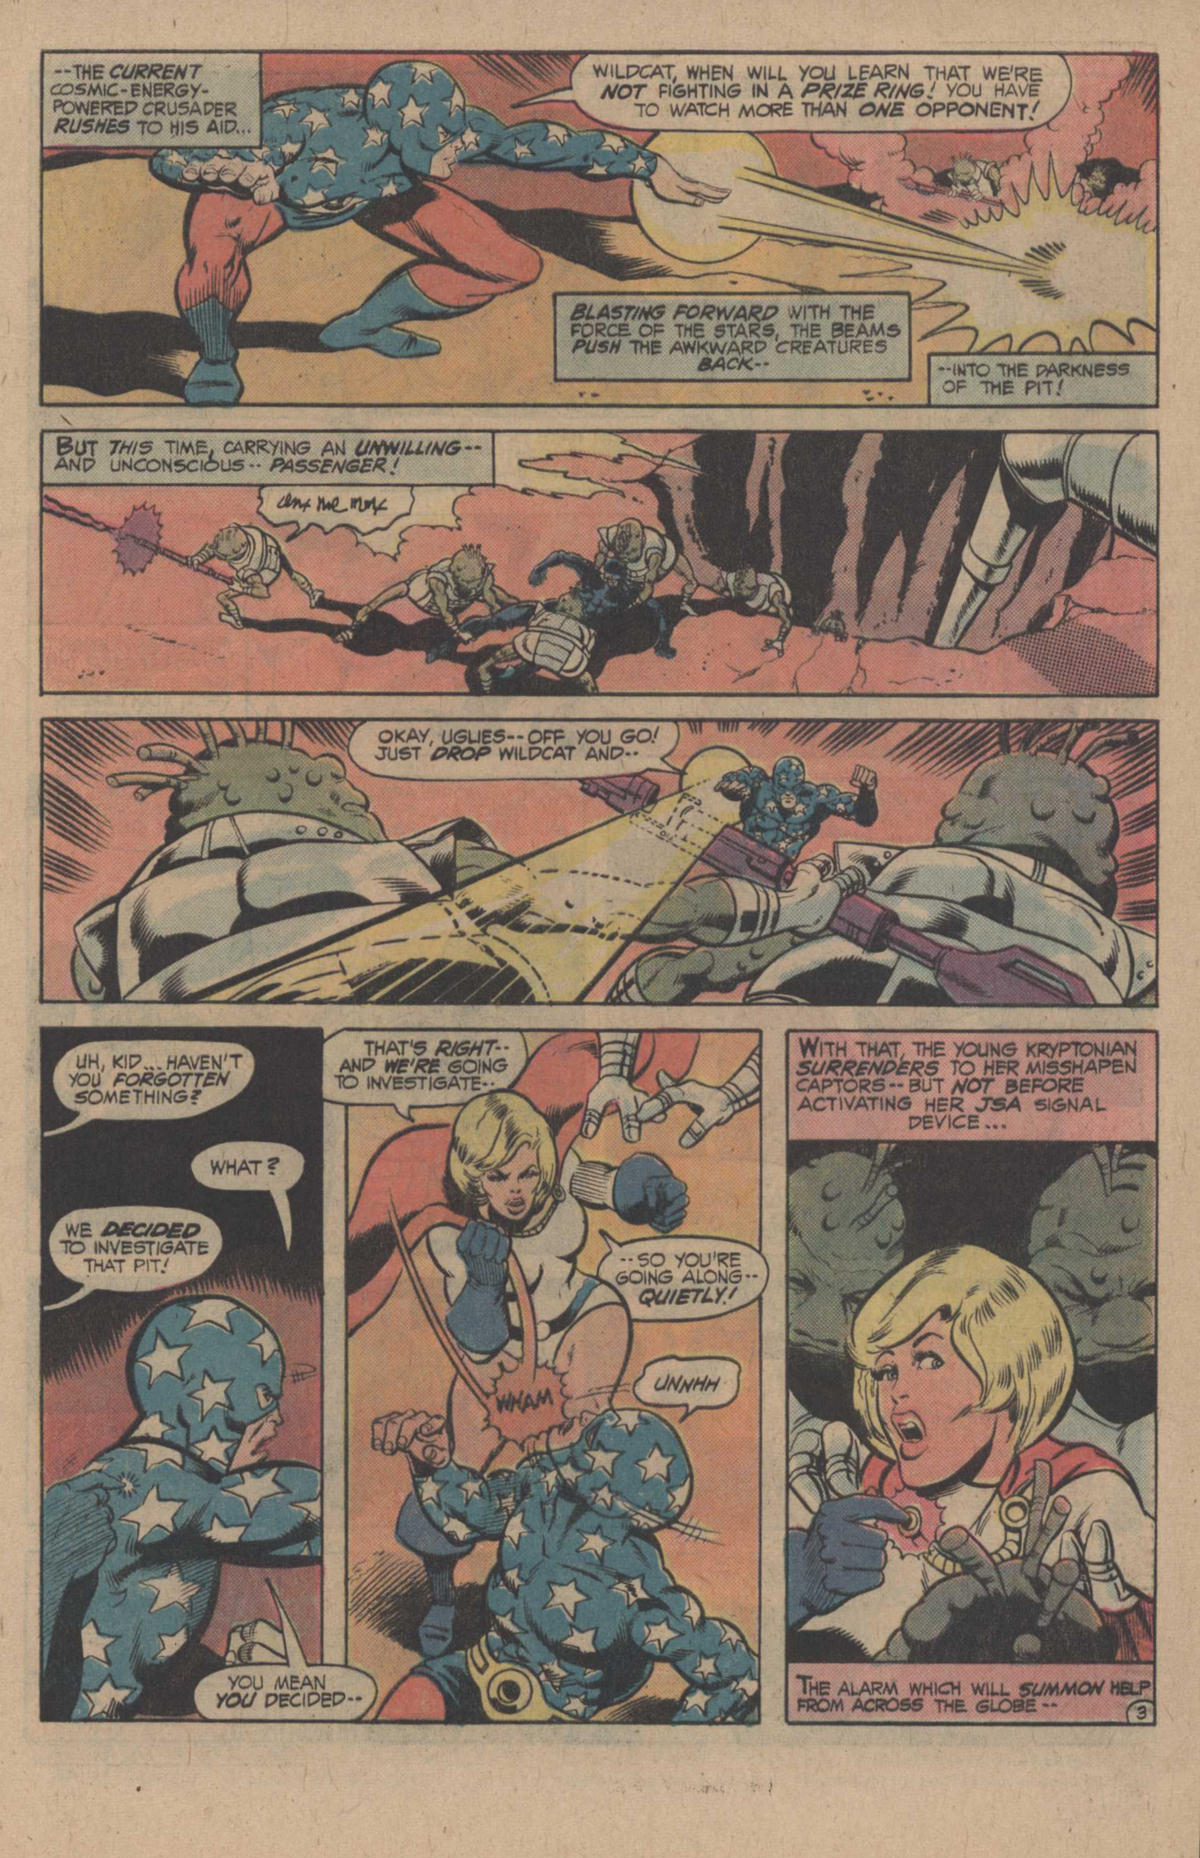 Read online All-Star Comics comic -  Issue #67 - 5